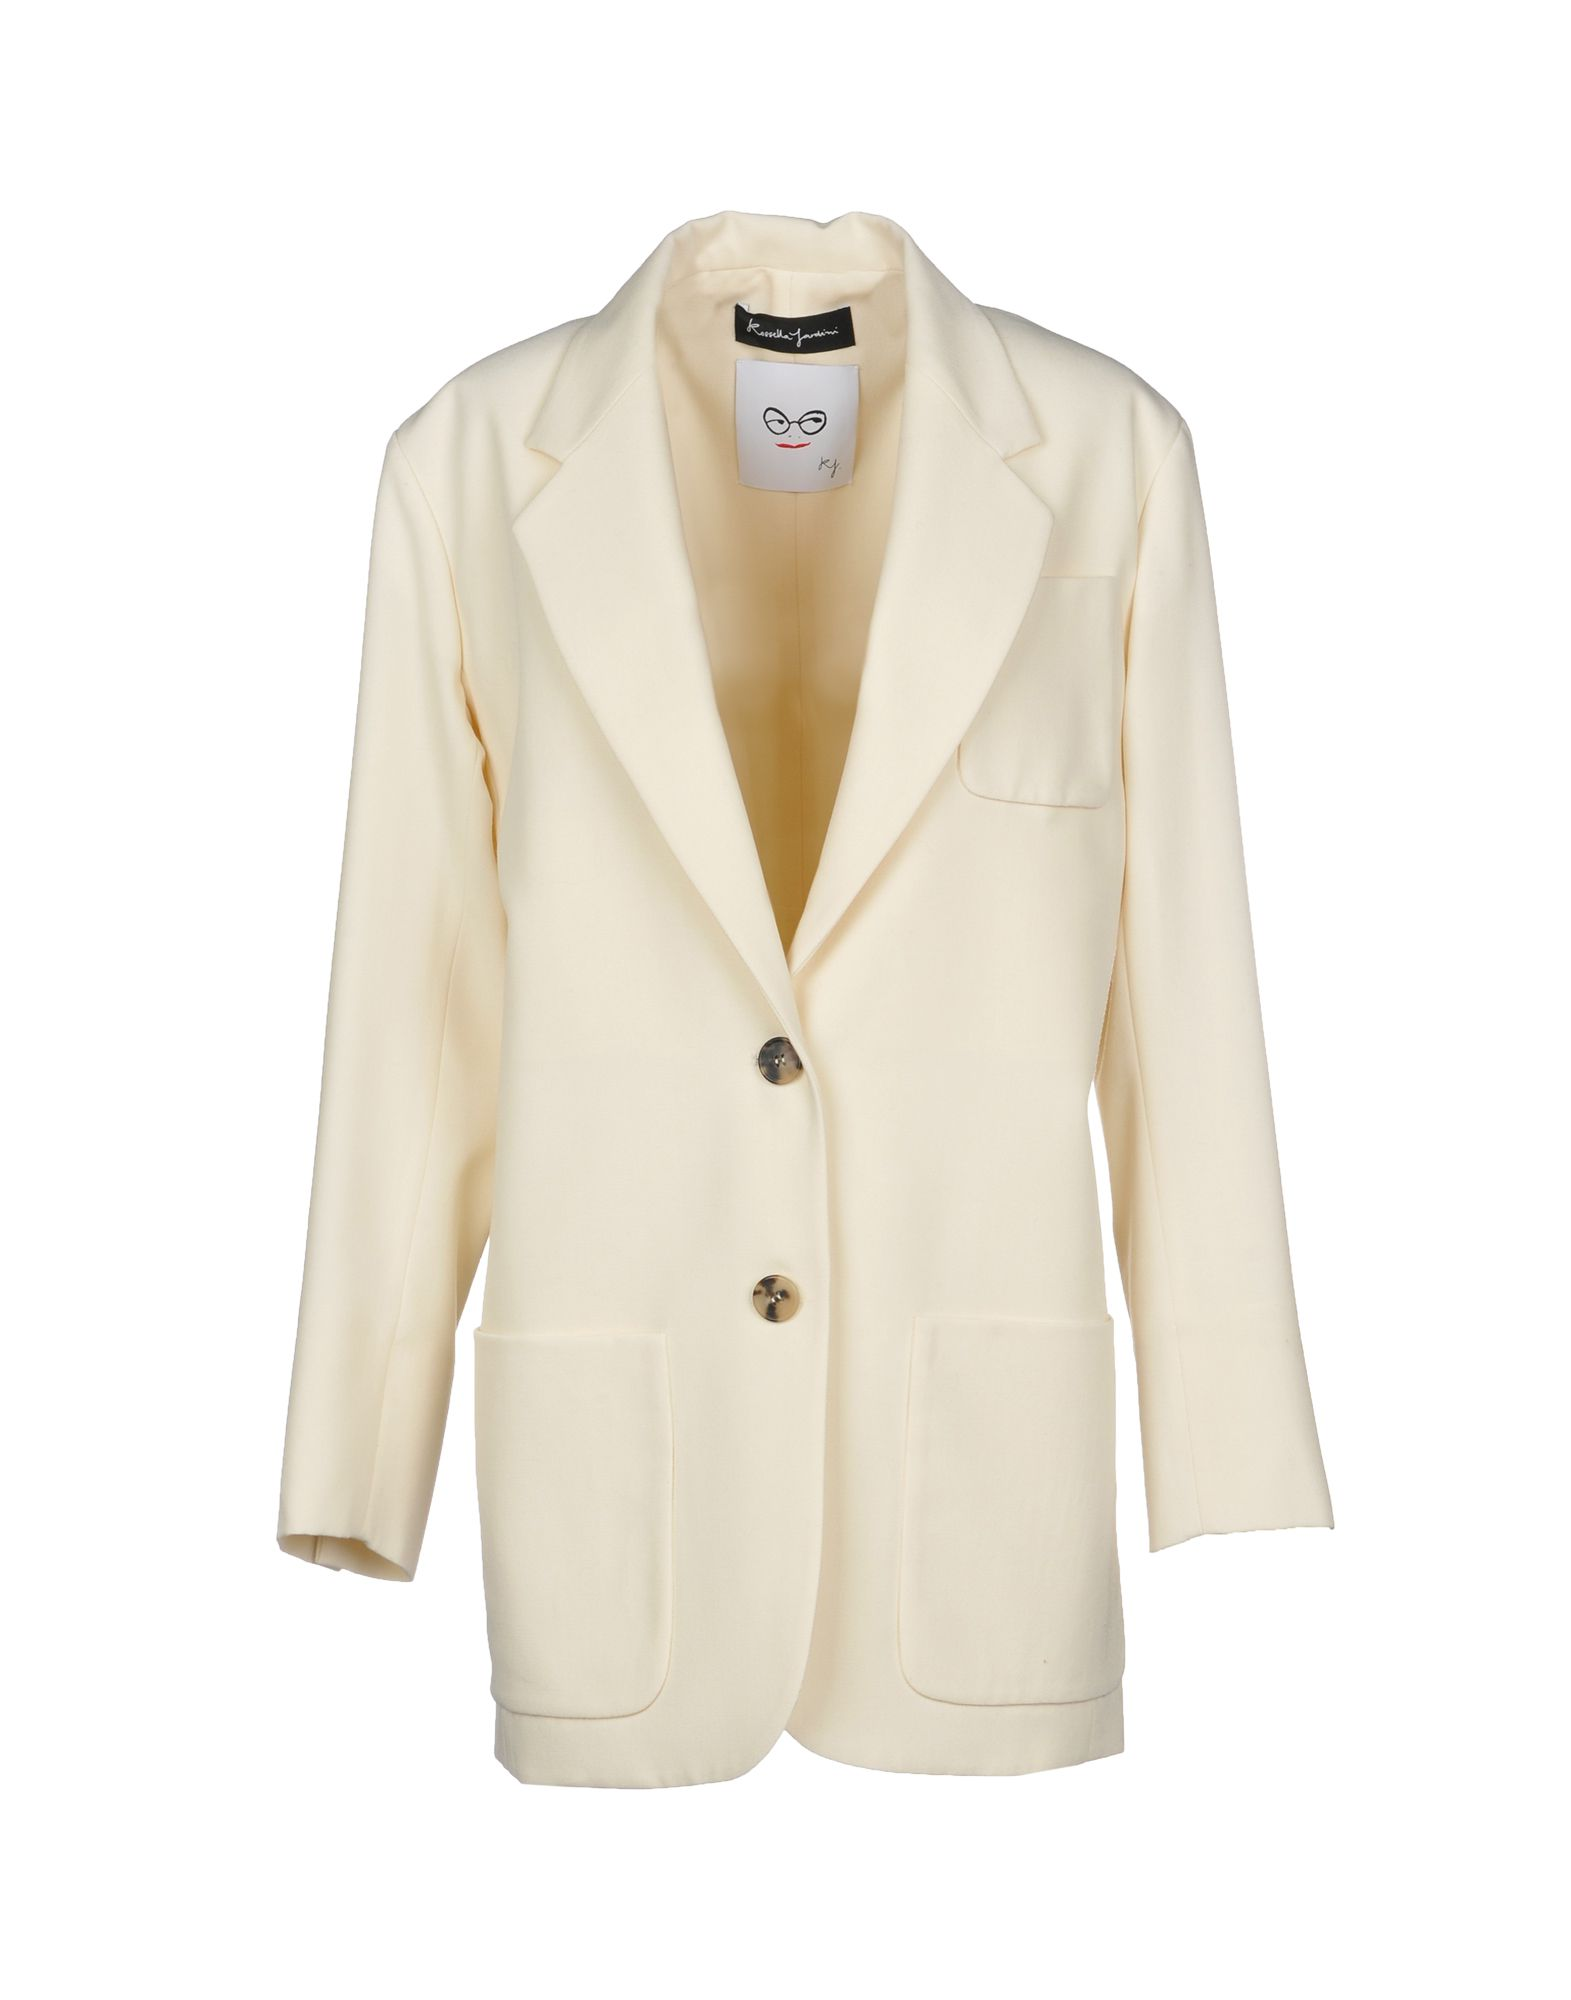 ROSSELLA JARDINI Full-Length Jacket in Ivory